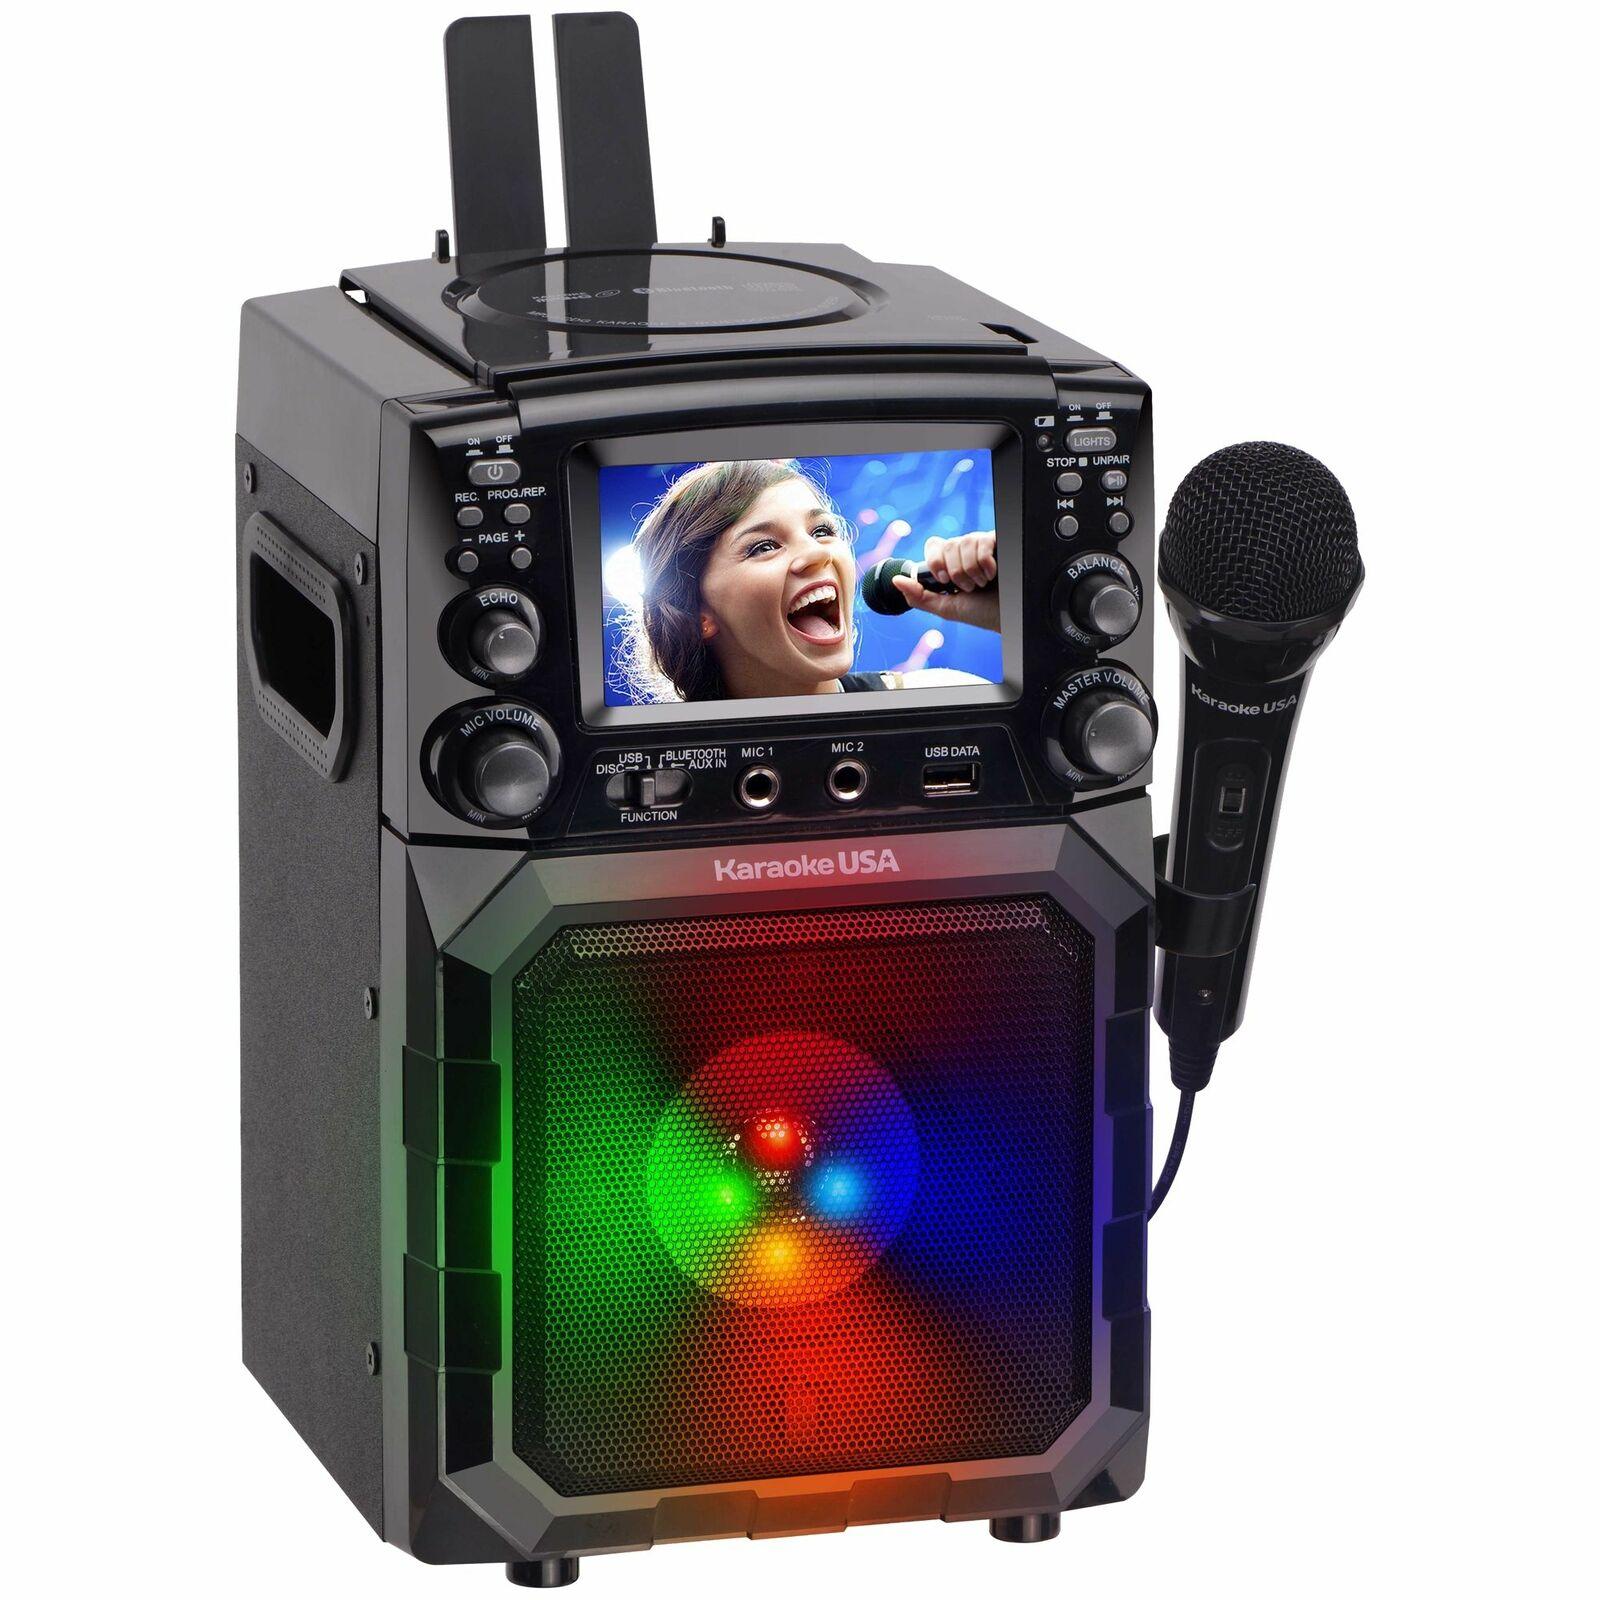 karaoke-usa-gq450-portable-rechargeable-dg-mp3g-bluetooth-karaoke-player